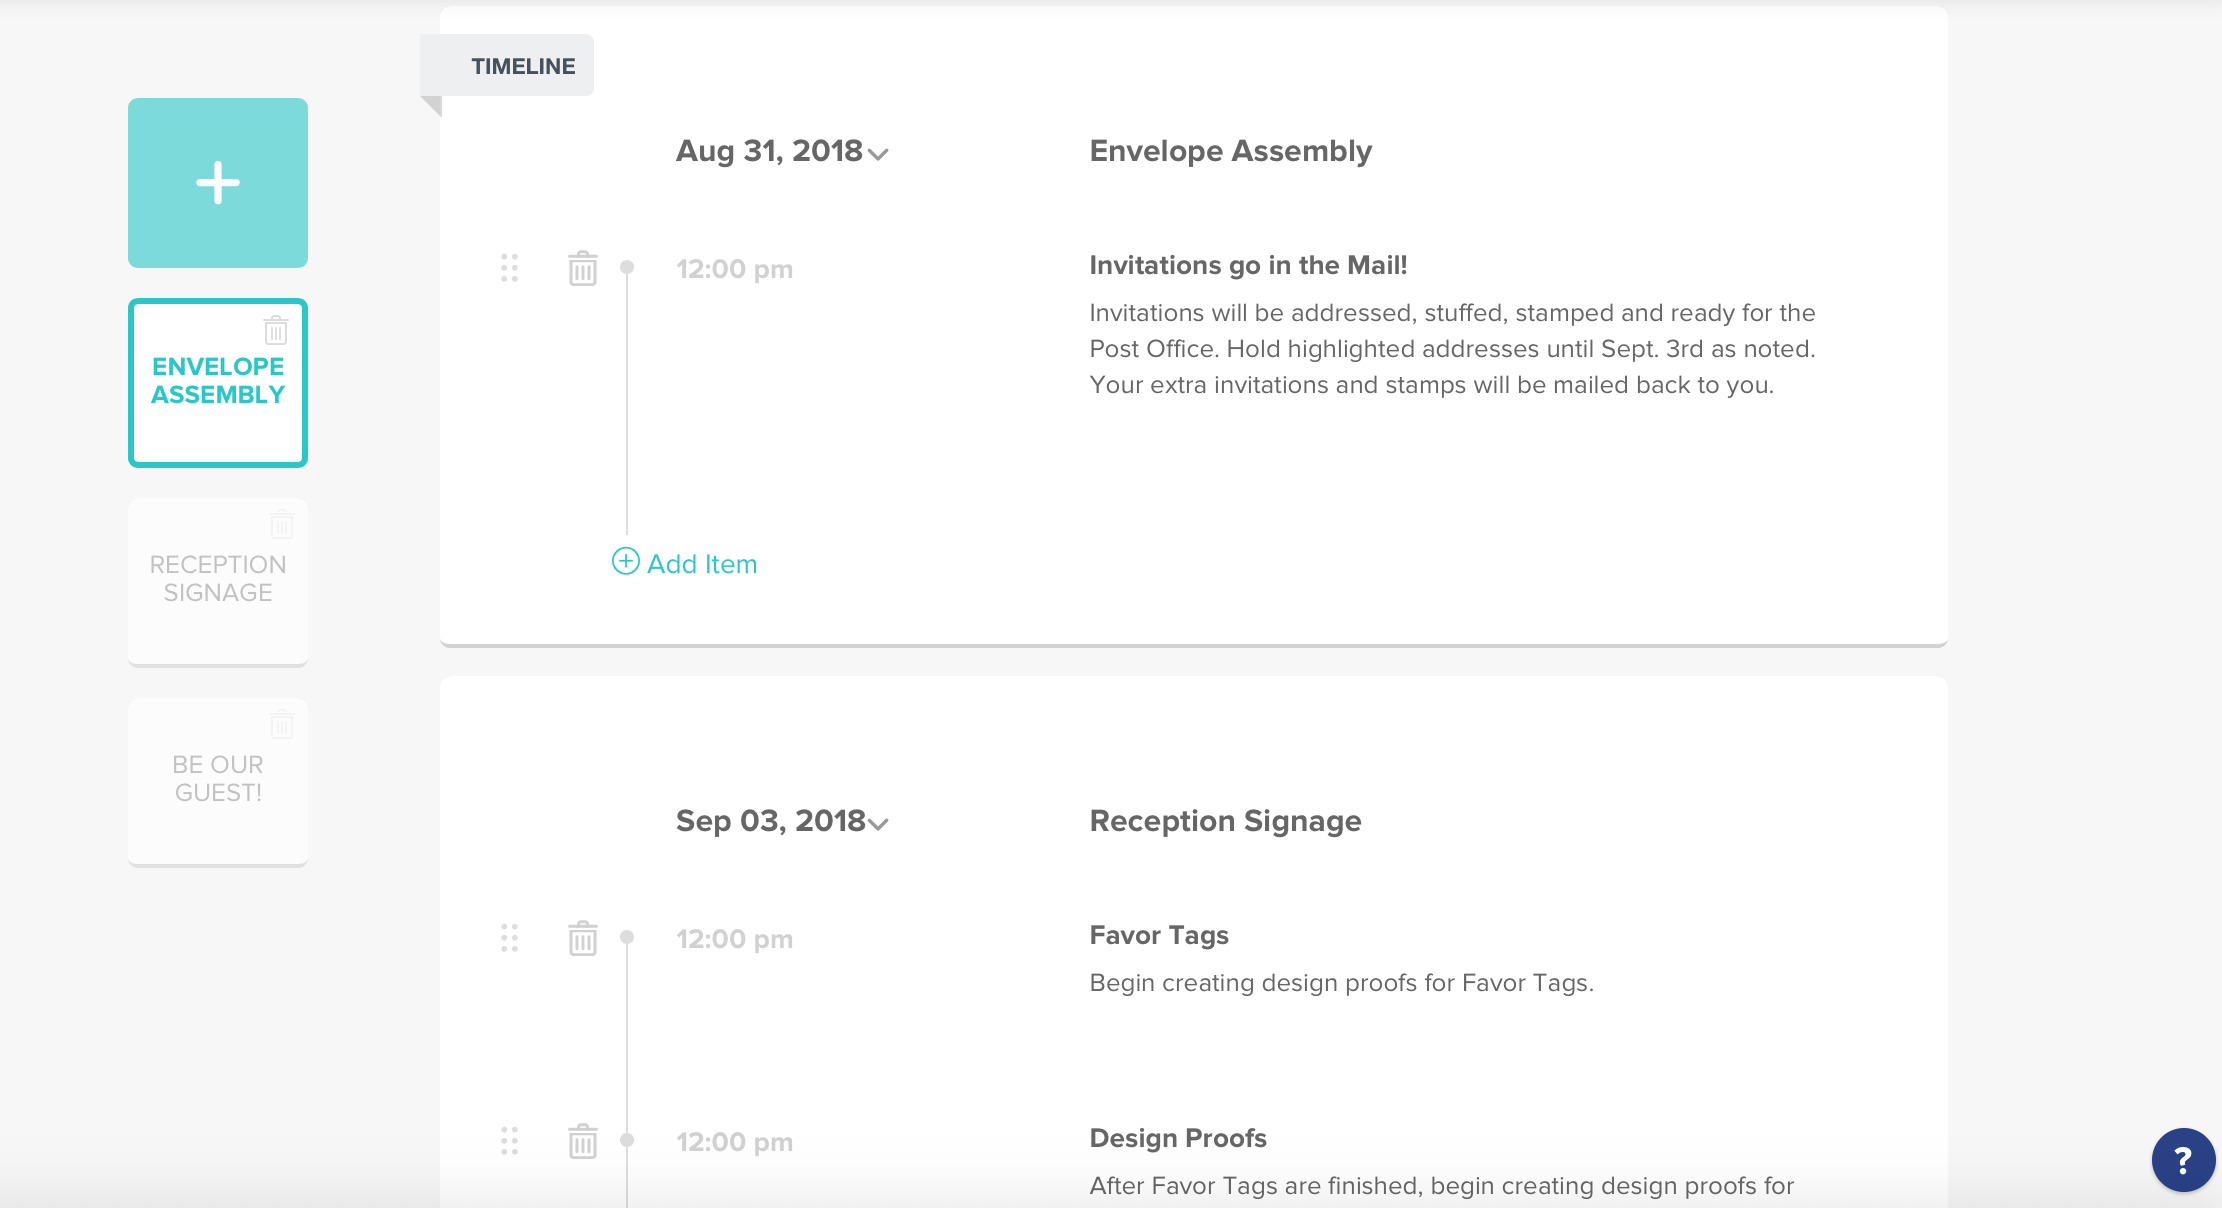 Timeline Templates for Creative Entrepreneurs via HoneyBook